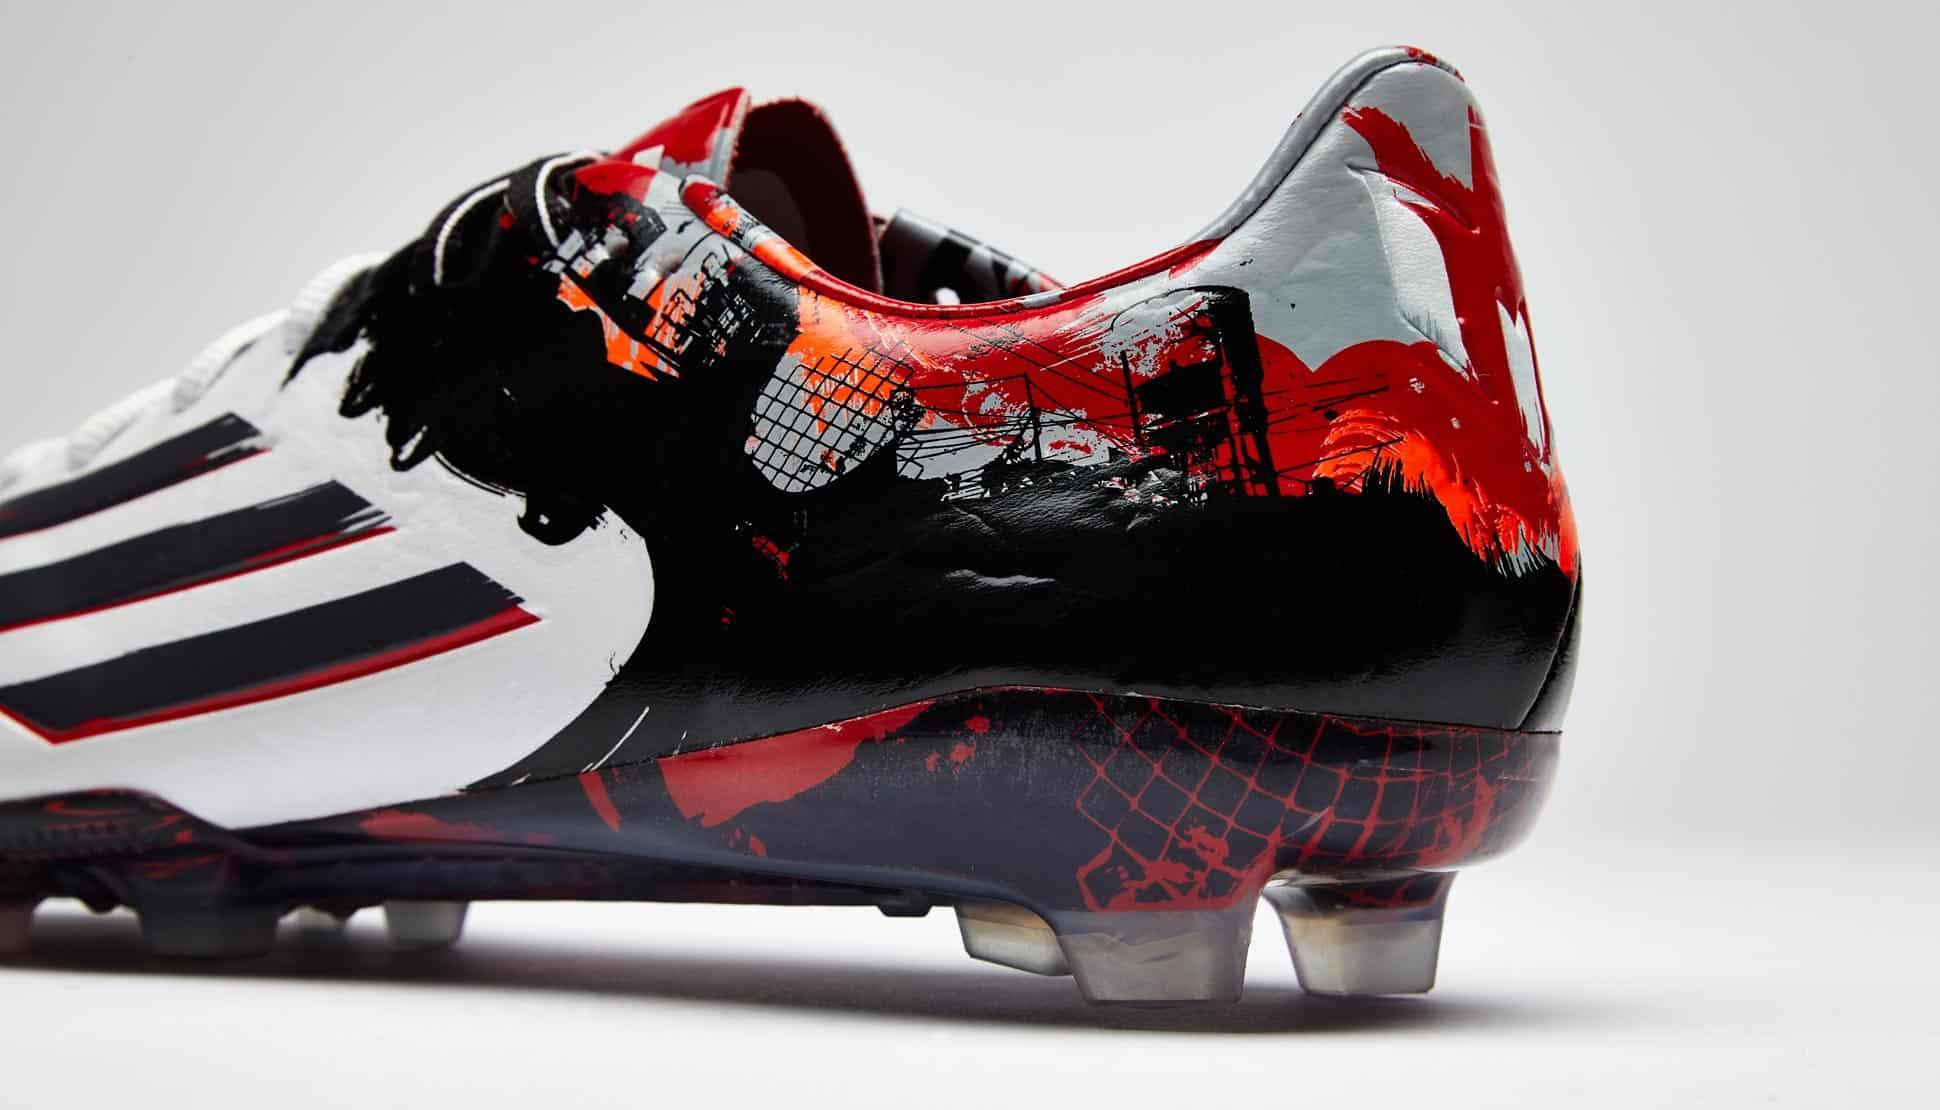 chaussure-football-adidas-PibedeBarr10-messi-Mars-2015-4